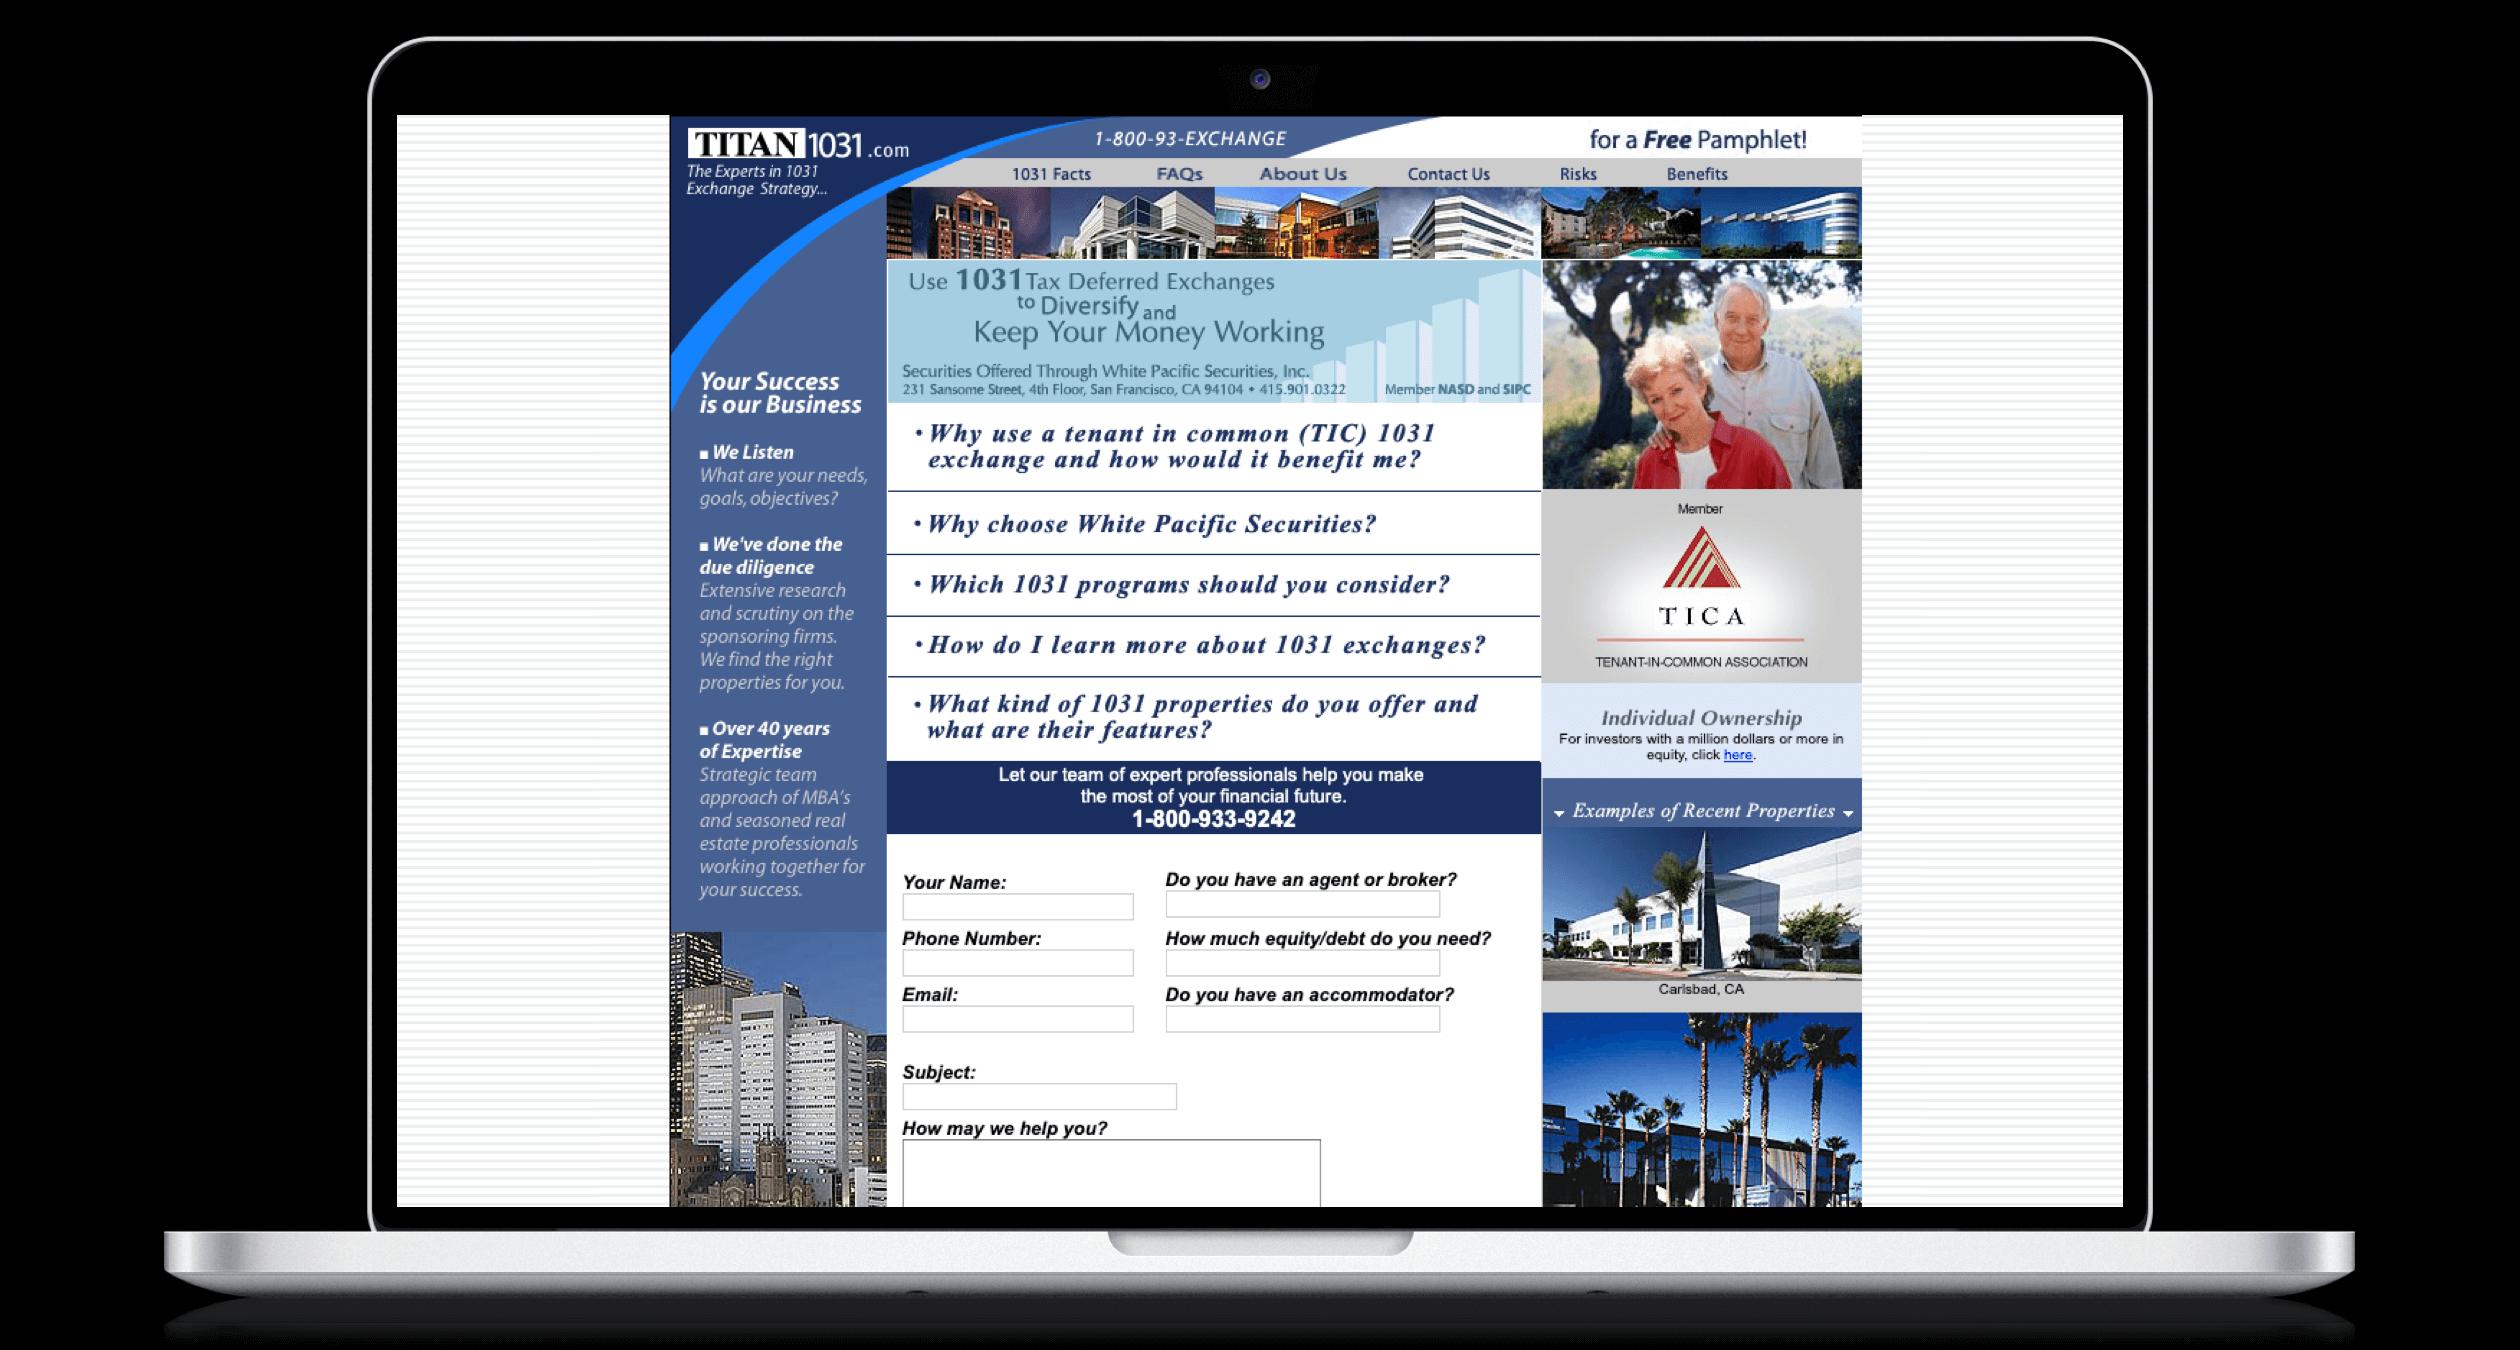 PHX-Web-Agency-Titan-1031-Real-Estate-Exchange-Website-Design-Before